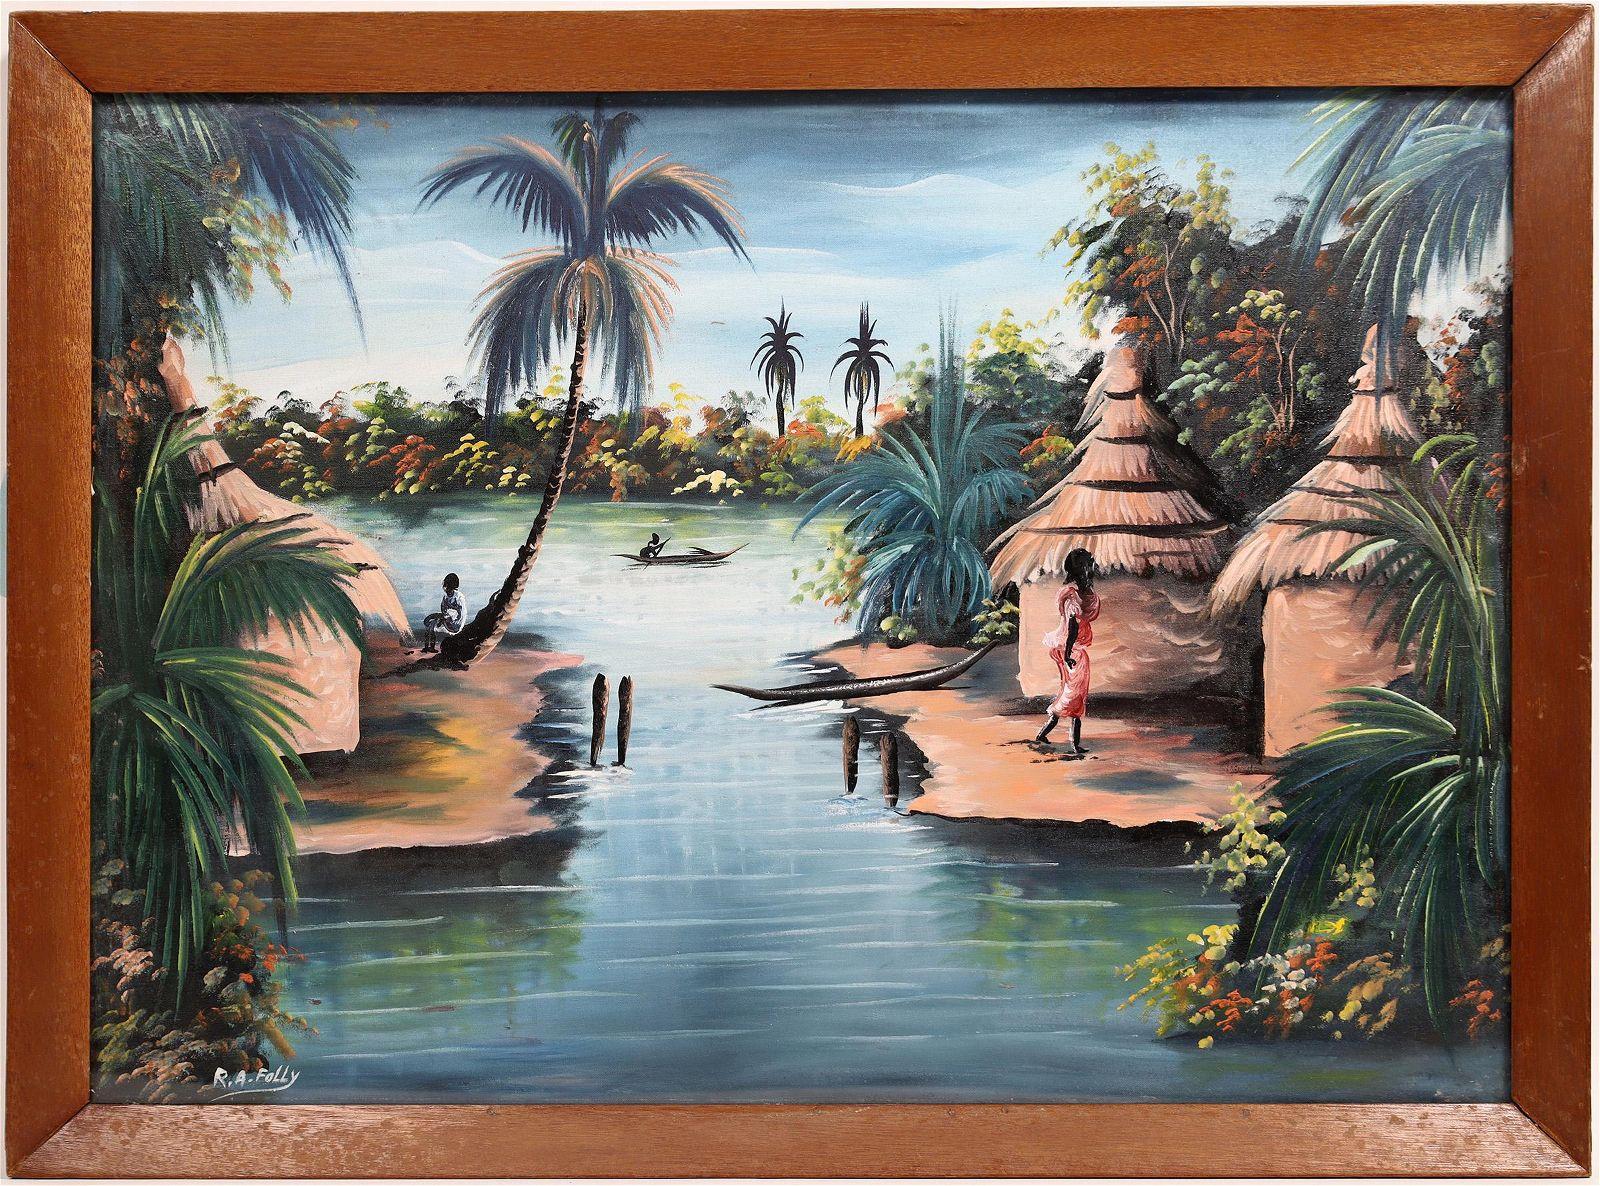 Original African Artwork Signed by Artist (2 oil